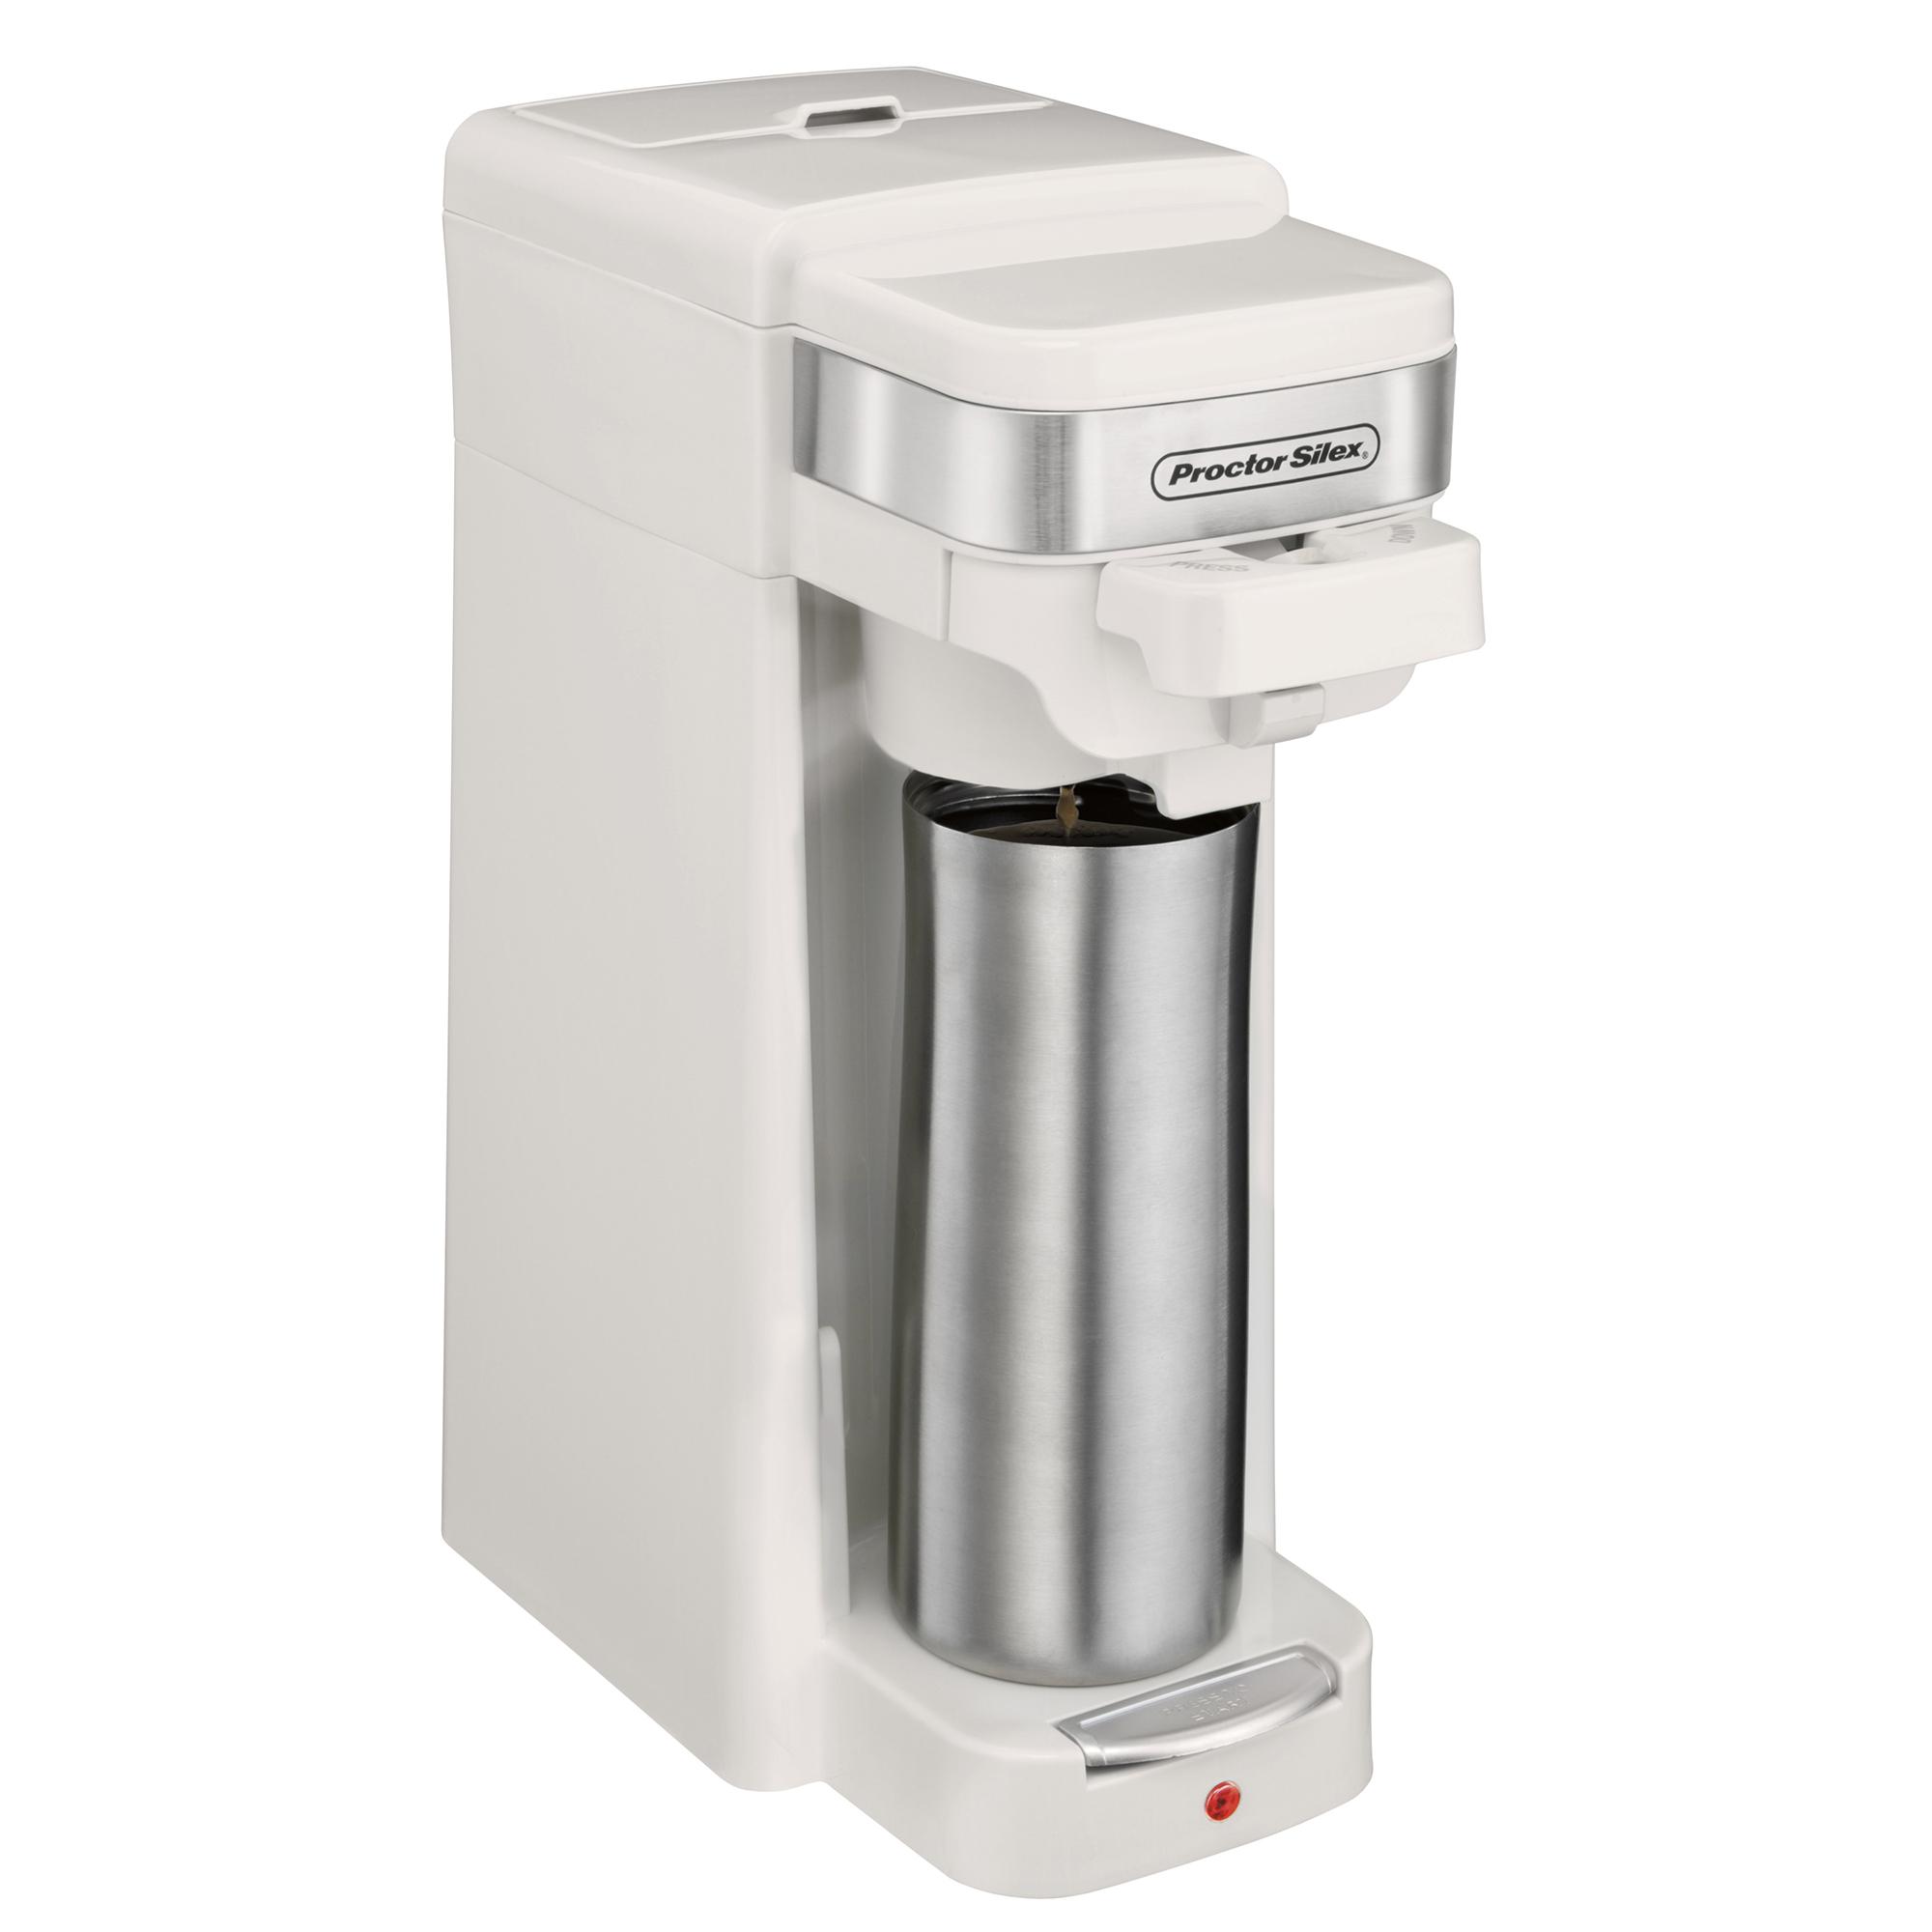 proctor silex single serve k cup compatible compact coffee. Black Bedroom Furniture Sets. Home Design Ideas